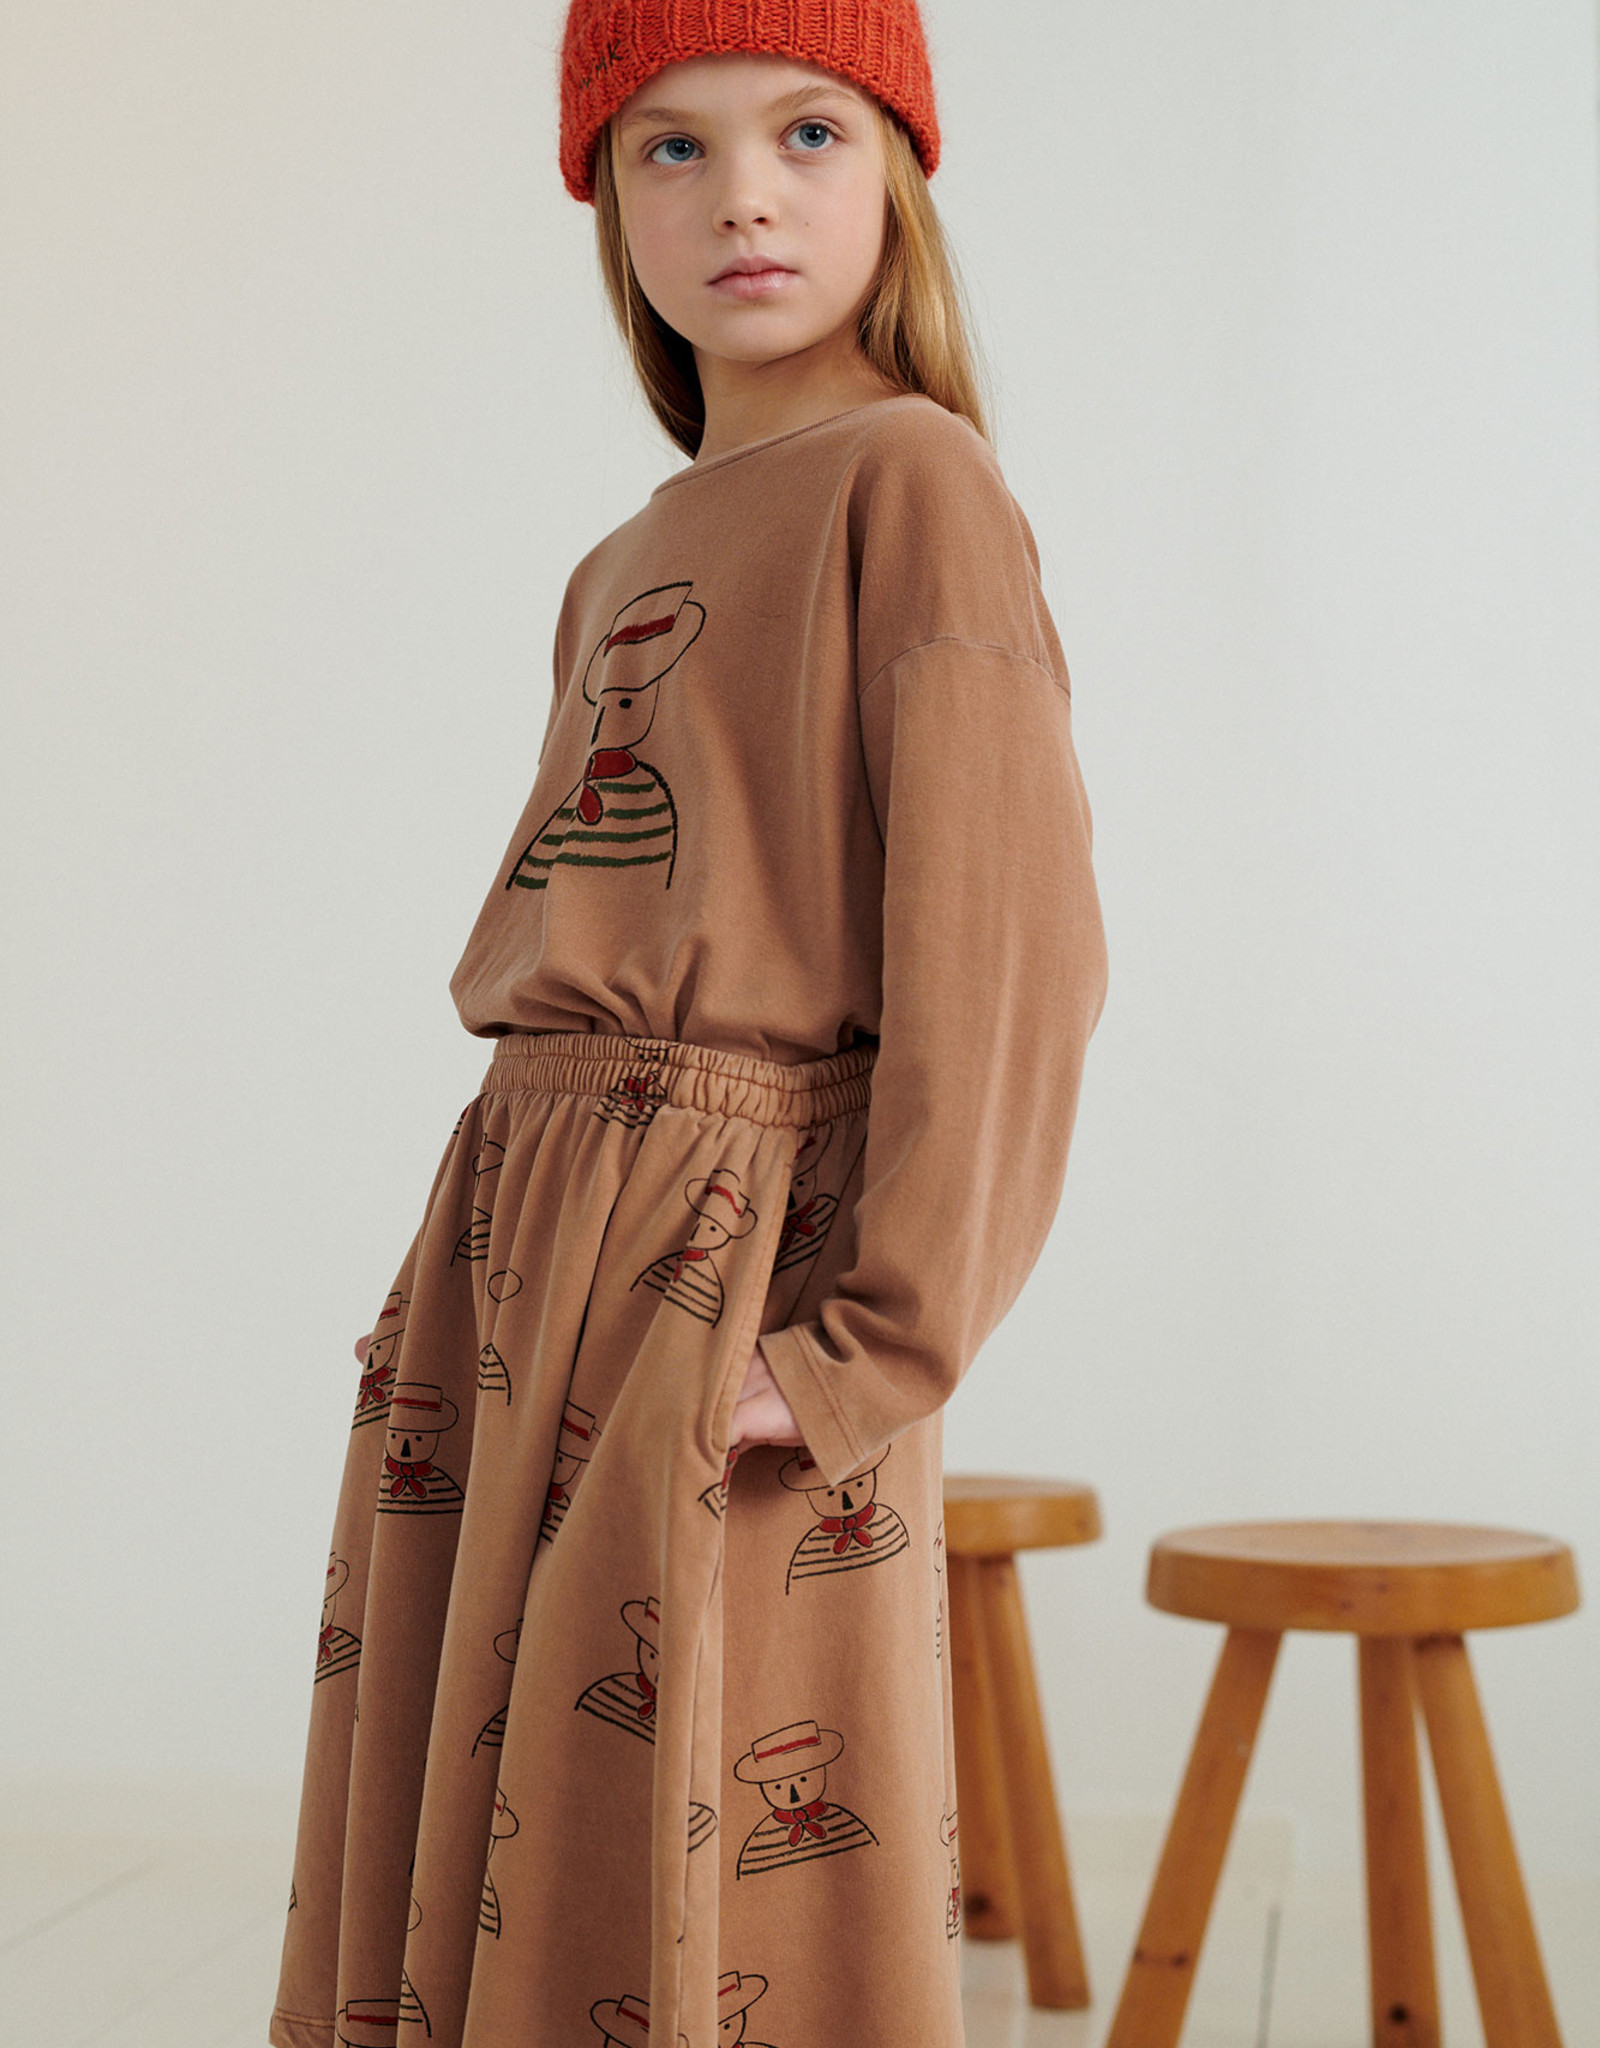 Weekend House Kids Gondolier Skirt Camel